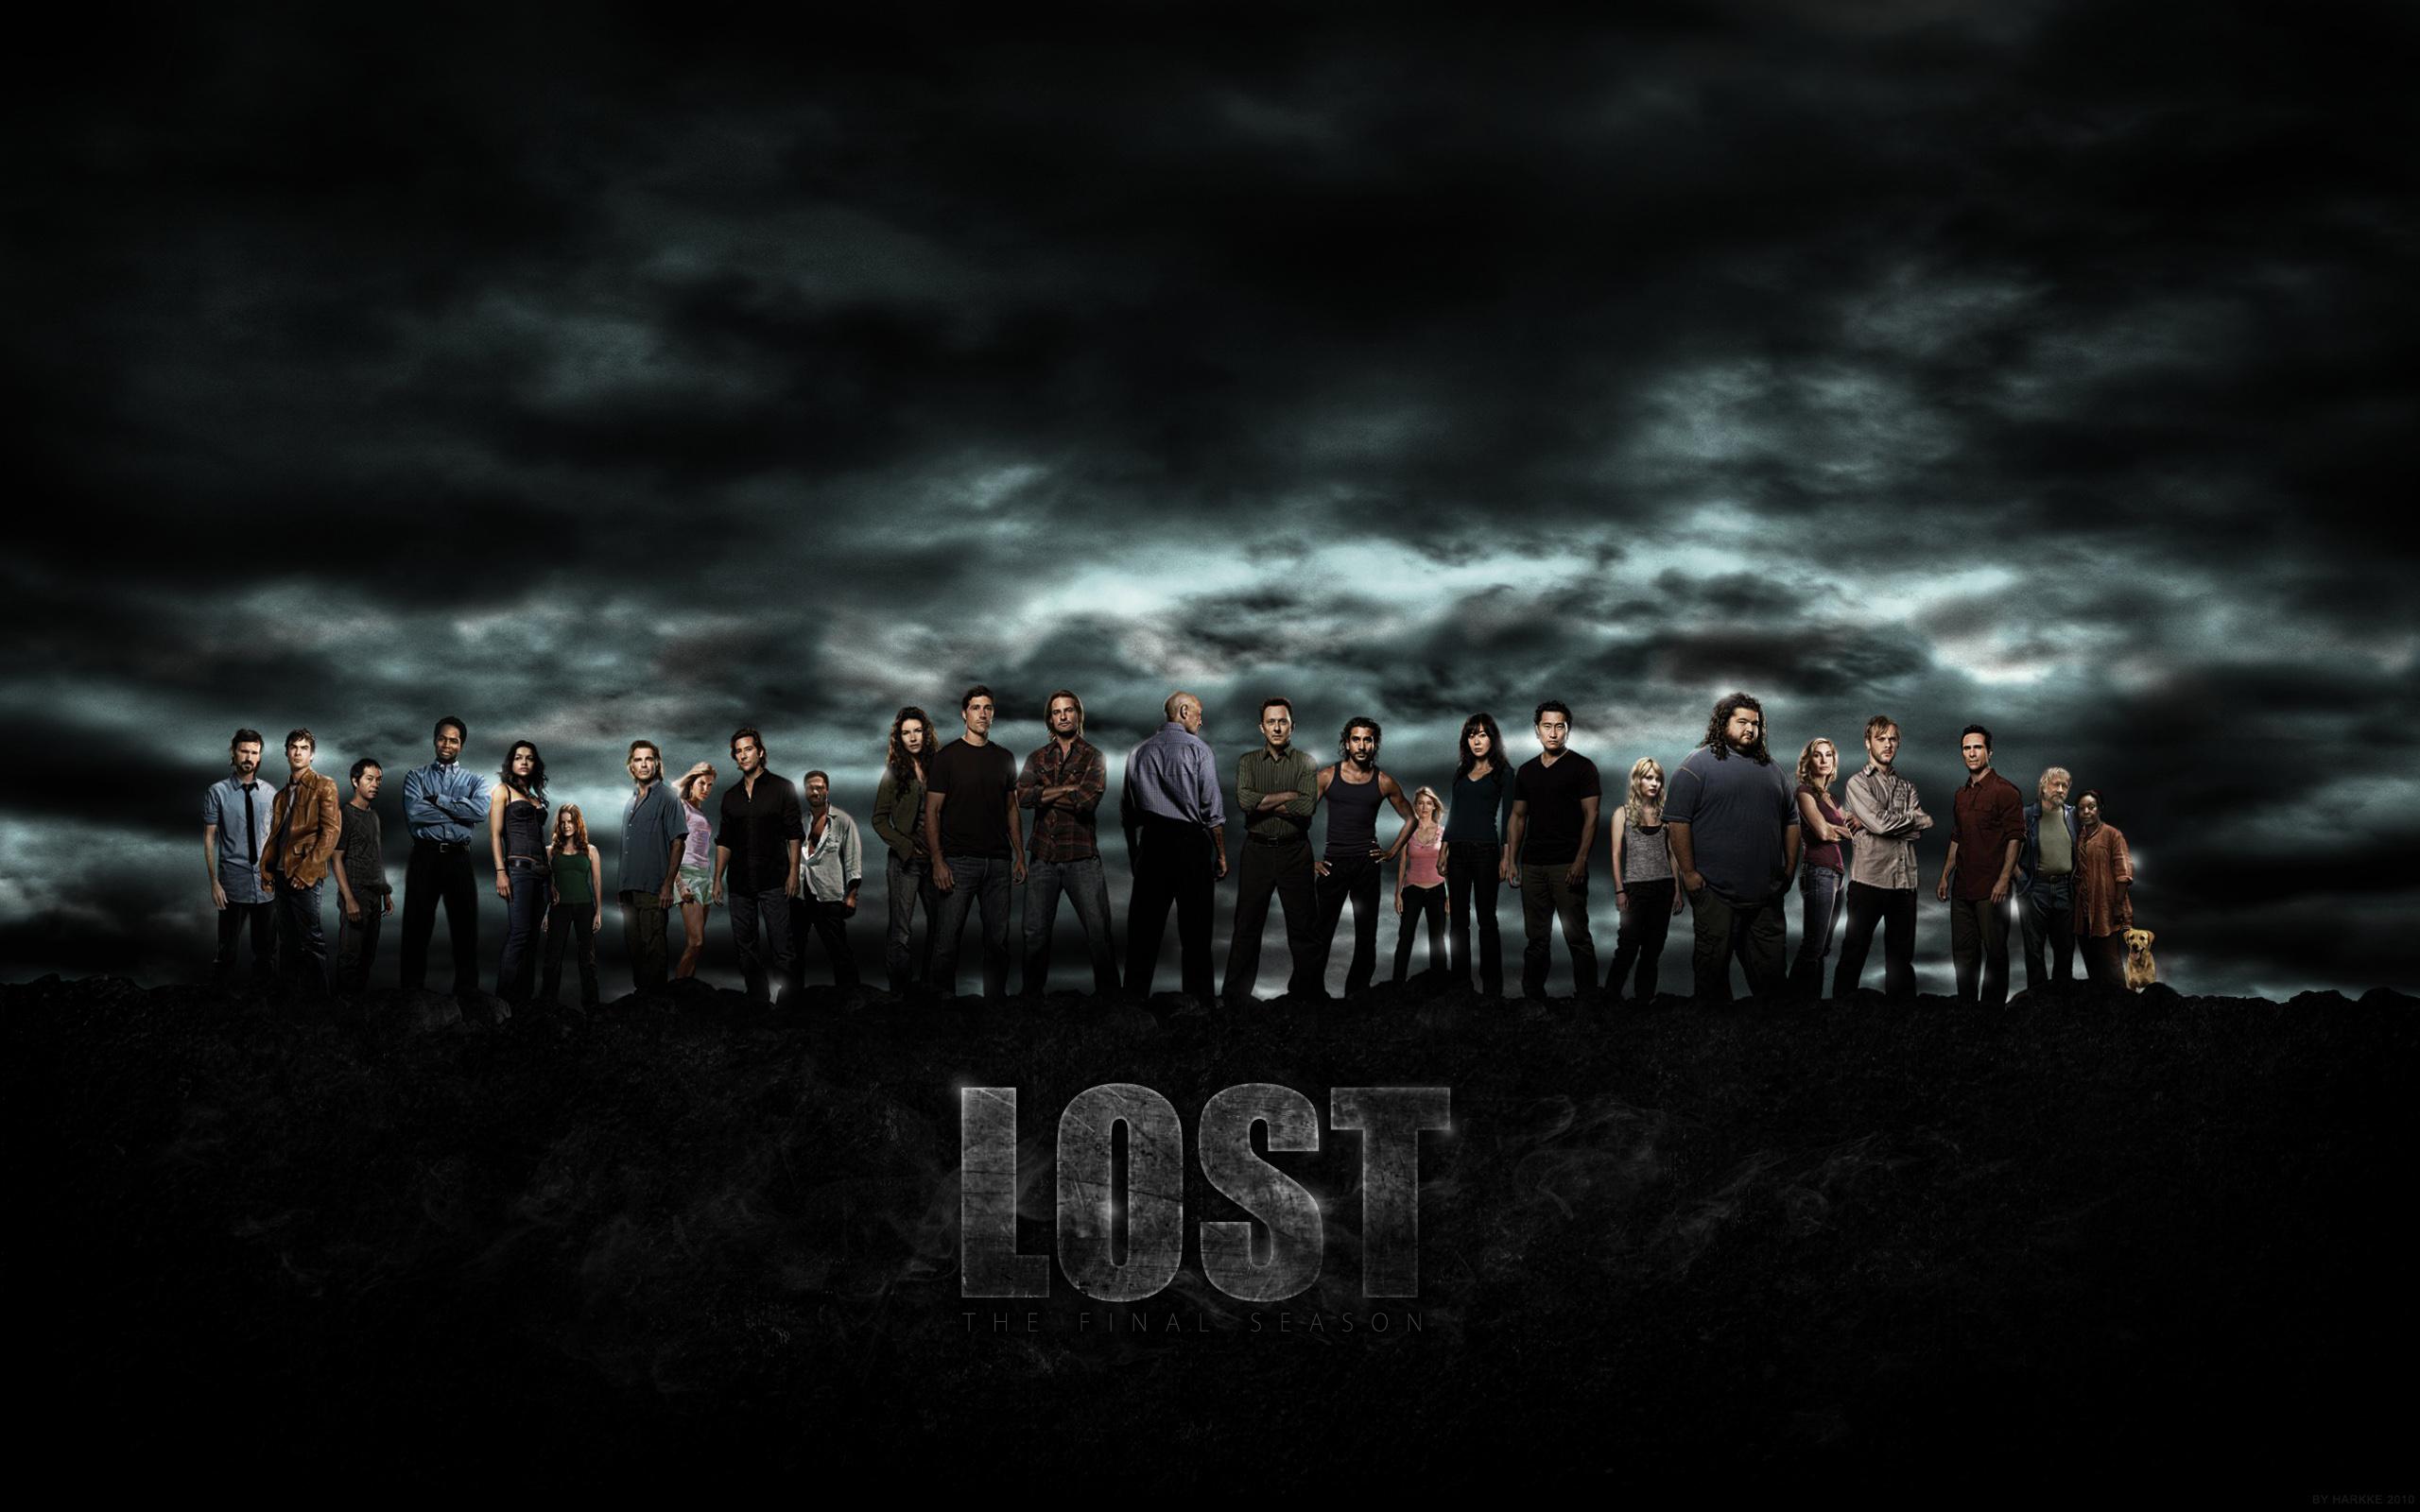 Lost wallpaper 7